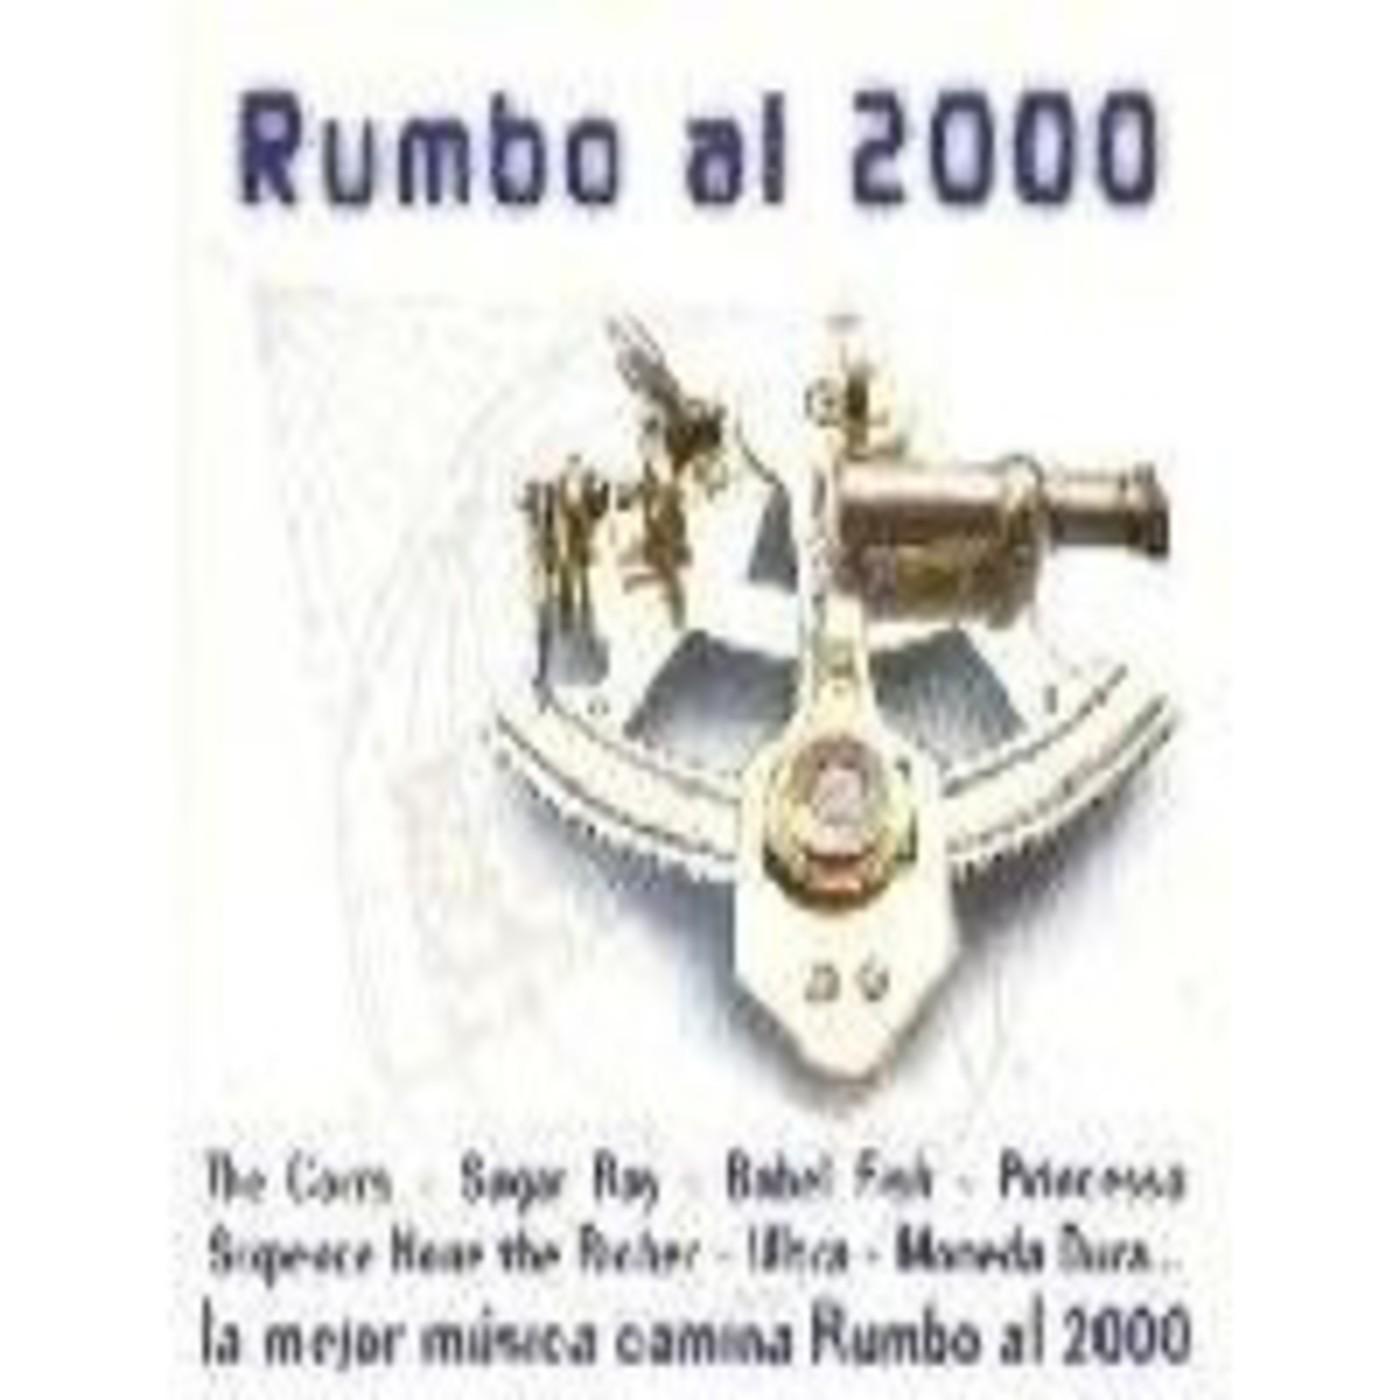 RUMBO AL 2000